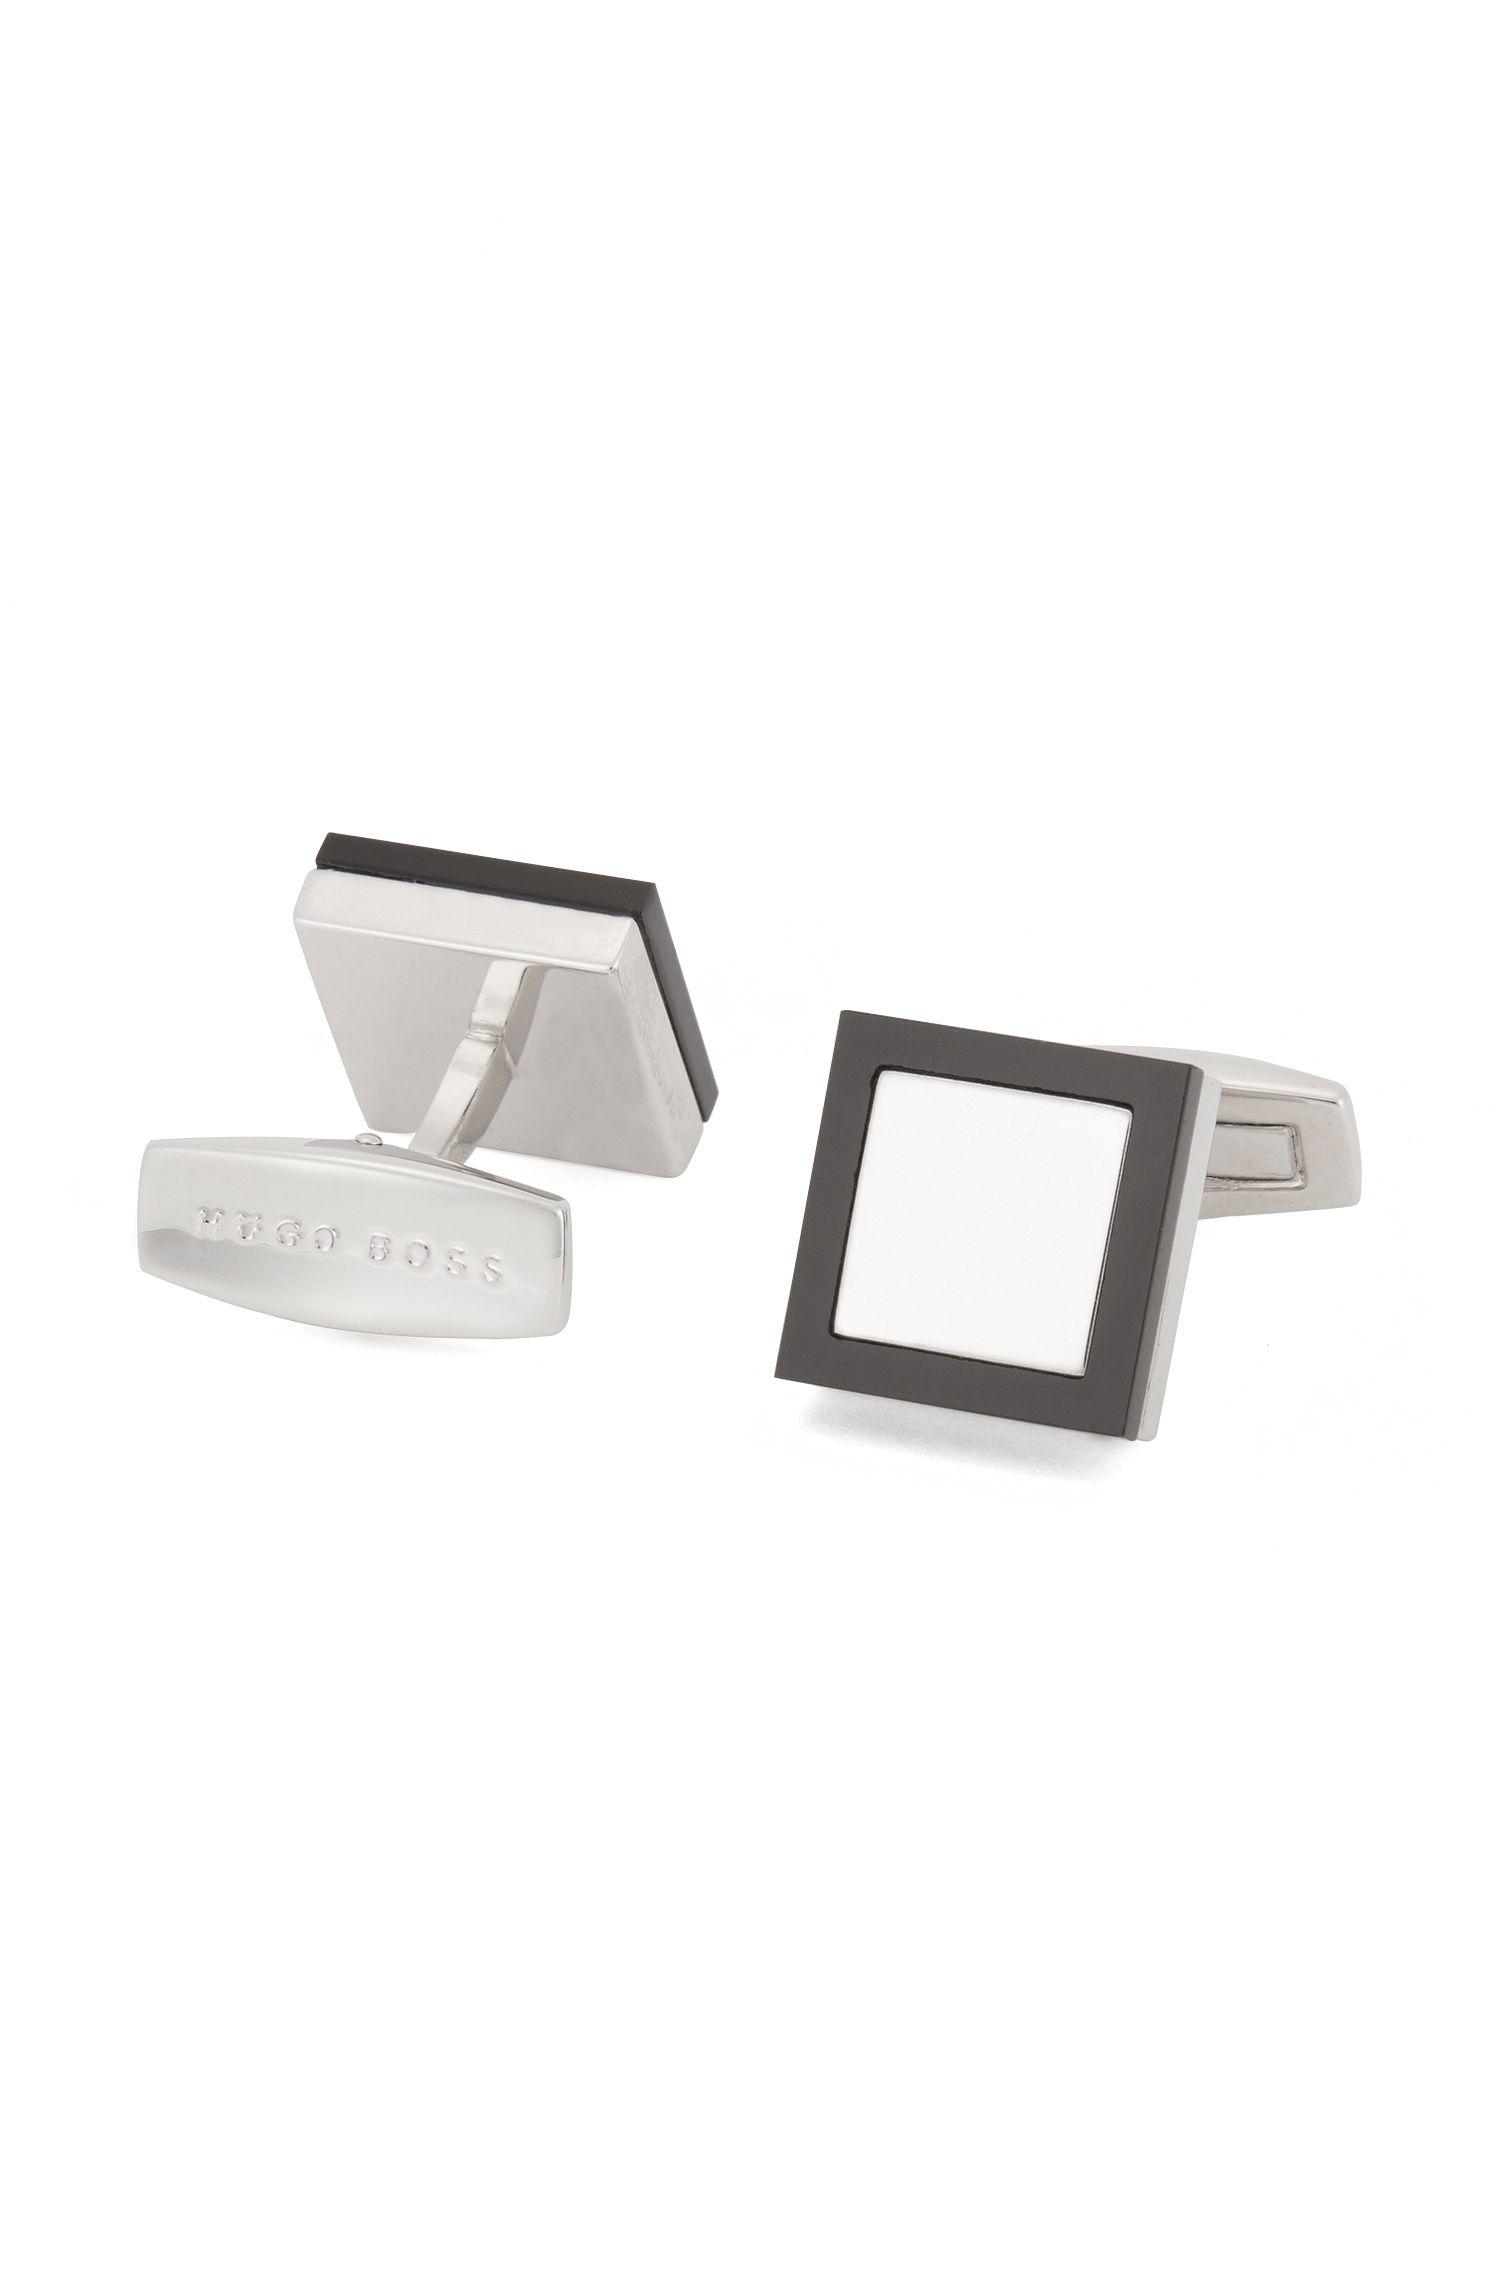 Square cufflinks with black onyx frame